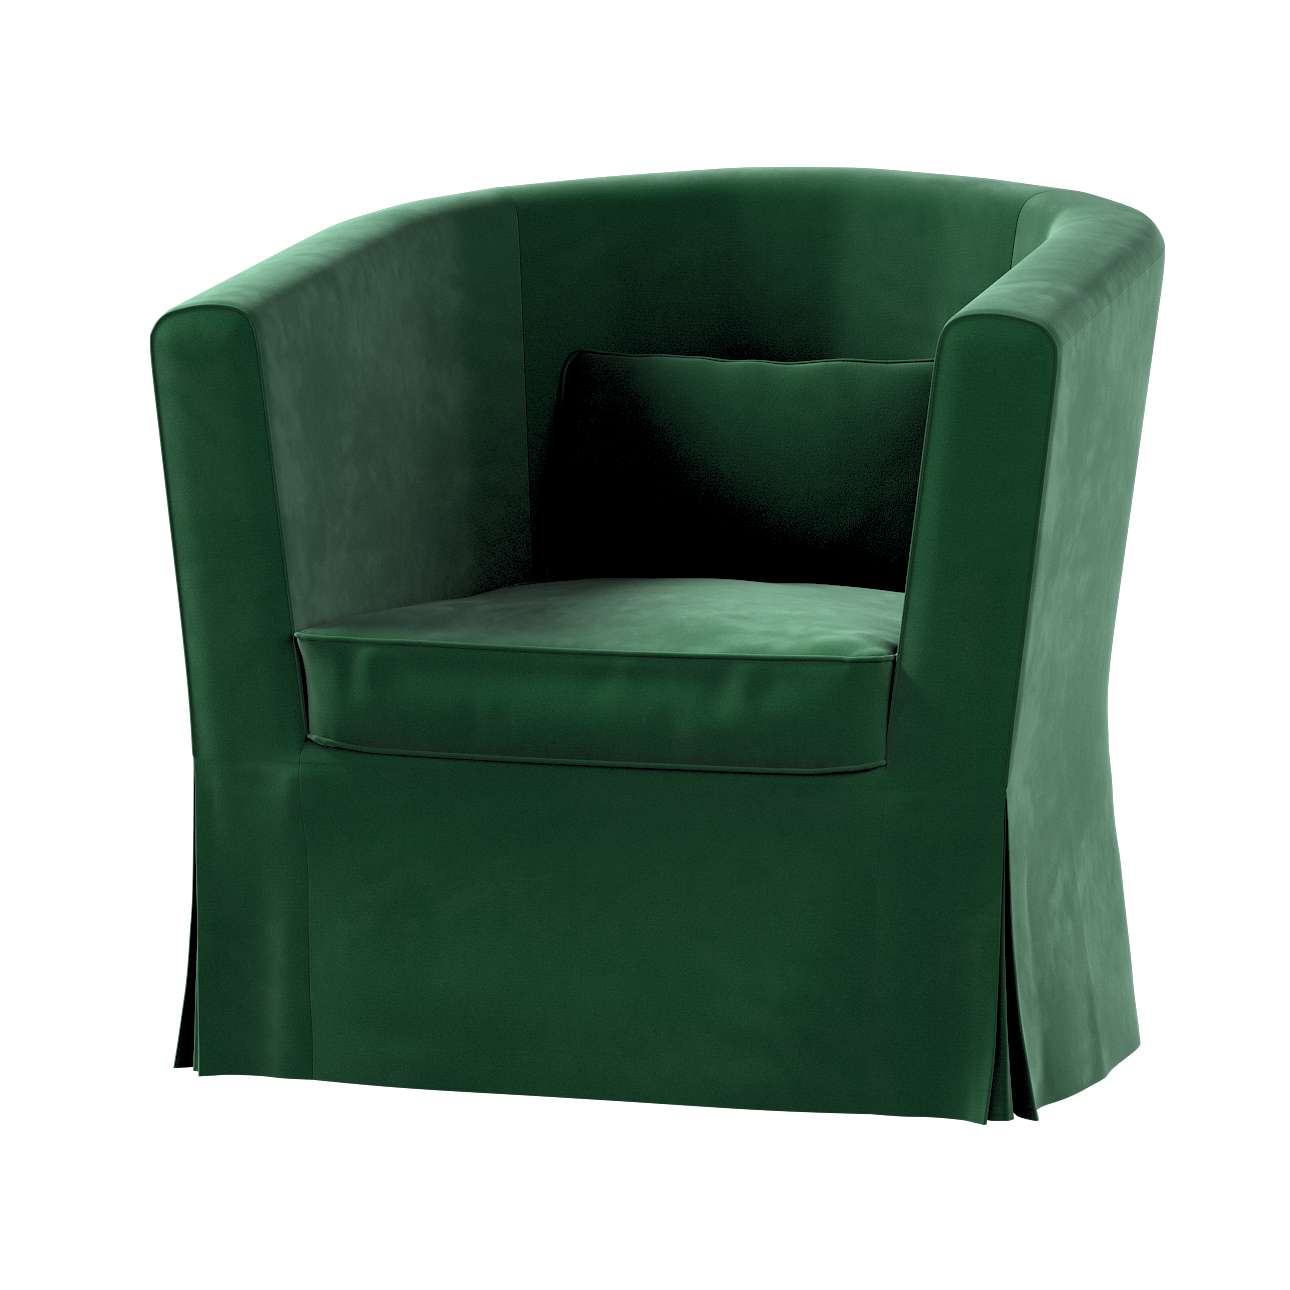 Pokrowiec na fotel Ektorp Tullsta w kolekcji Velvet, tkanina: 704-13